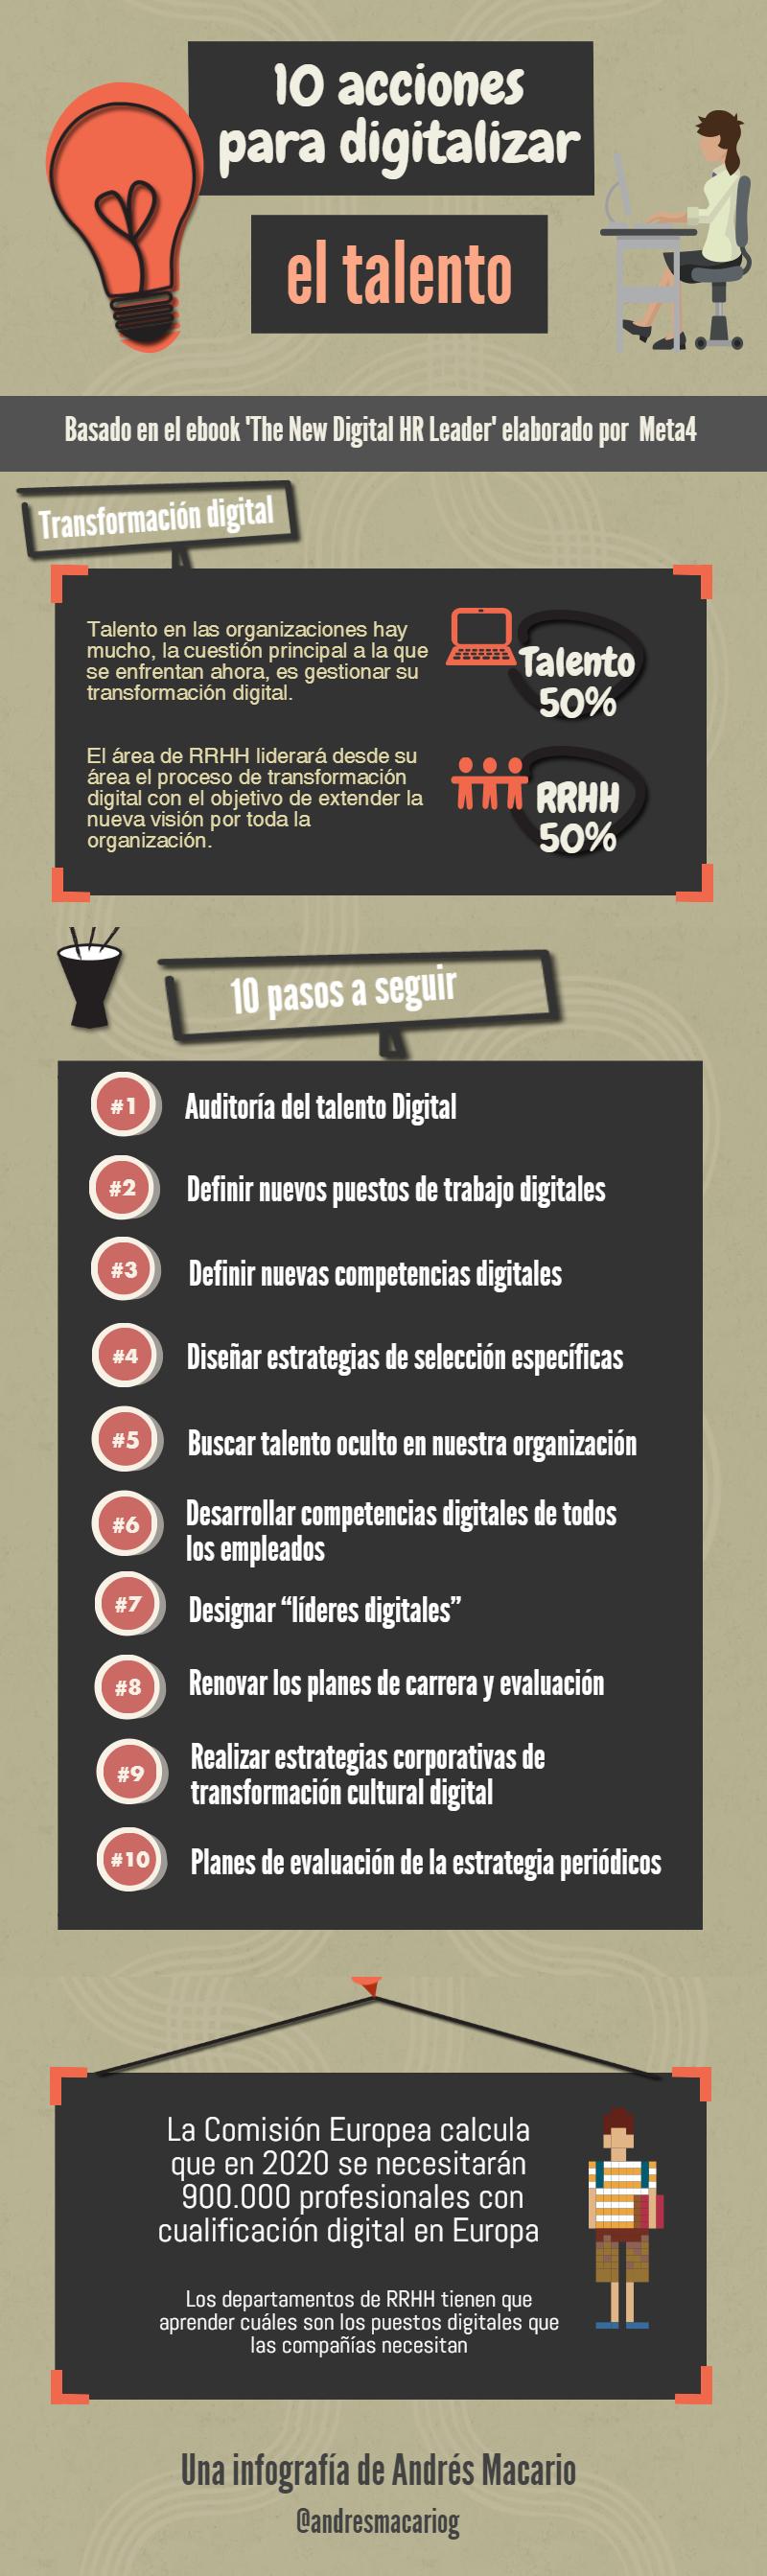 10 acciones digitalizar talento - Infografia Andres Macario